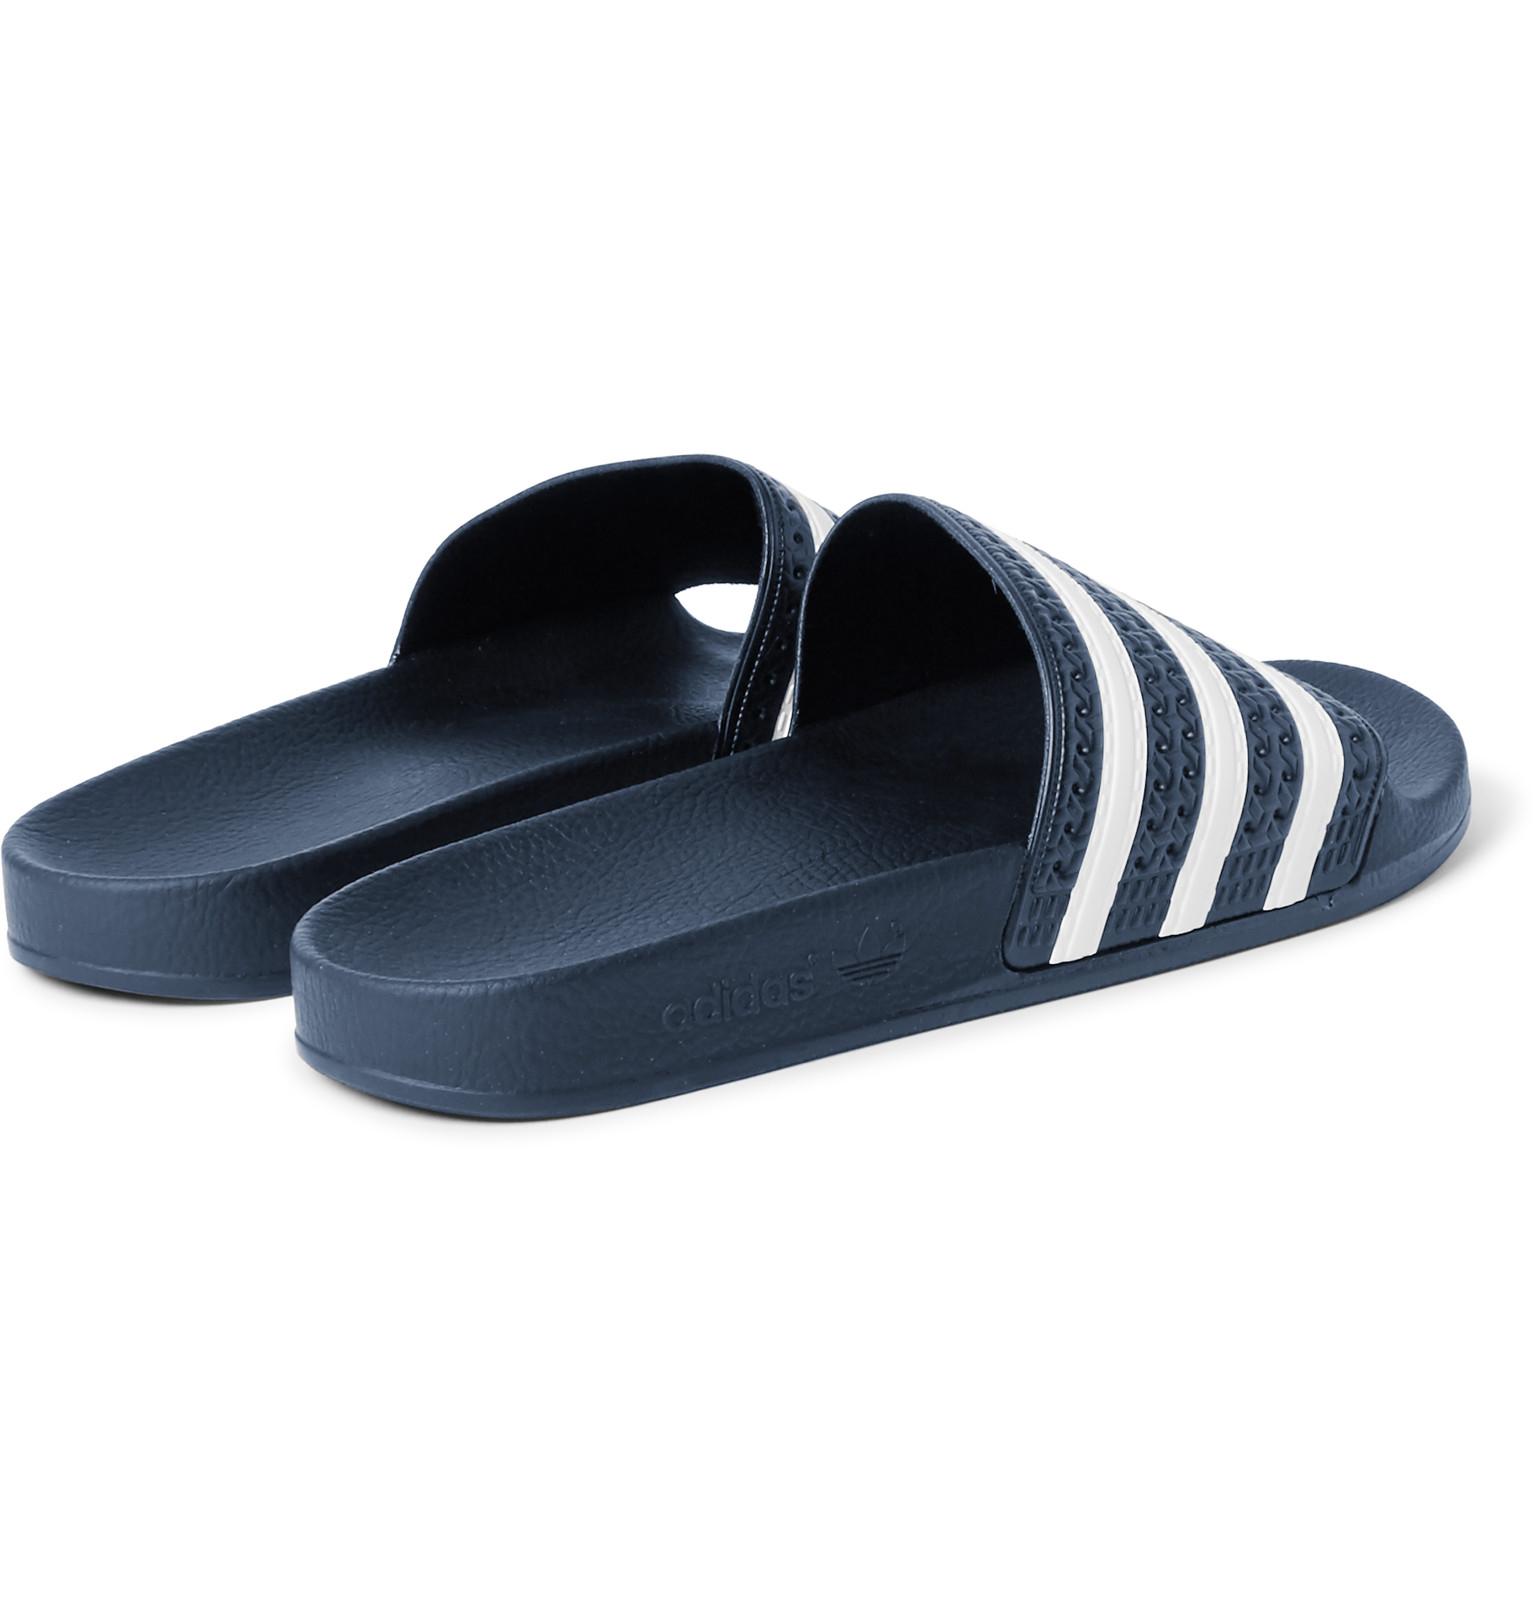 d261ead41c9 adidas Originals Adilette Textured-rubber Slides in Black for Men - Lyst